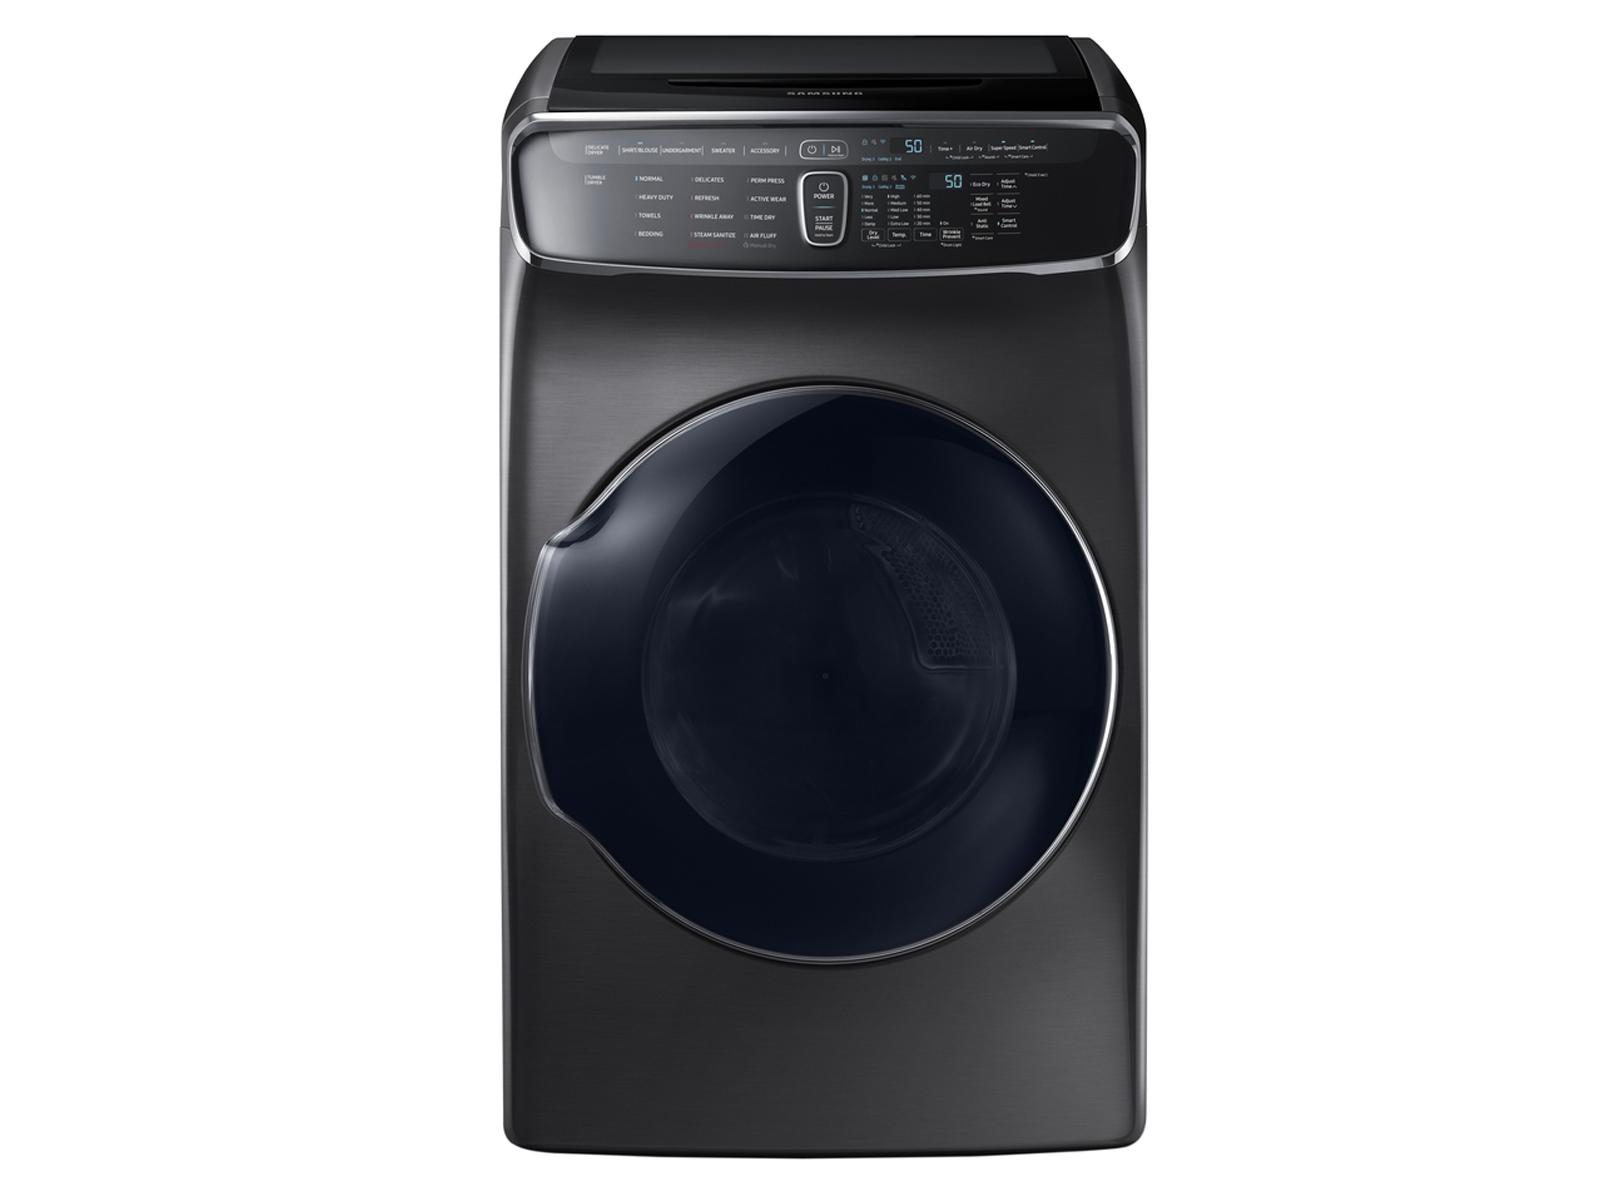 Samsung 7.5 cu. ft. FlexDry Electric Dryer in Black Stainless Steel , Fingerprint Resistant Black Stainless Steel